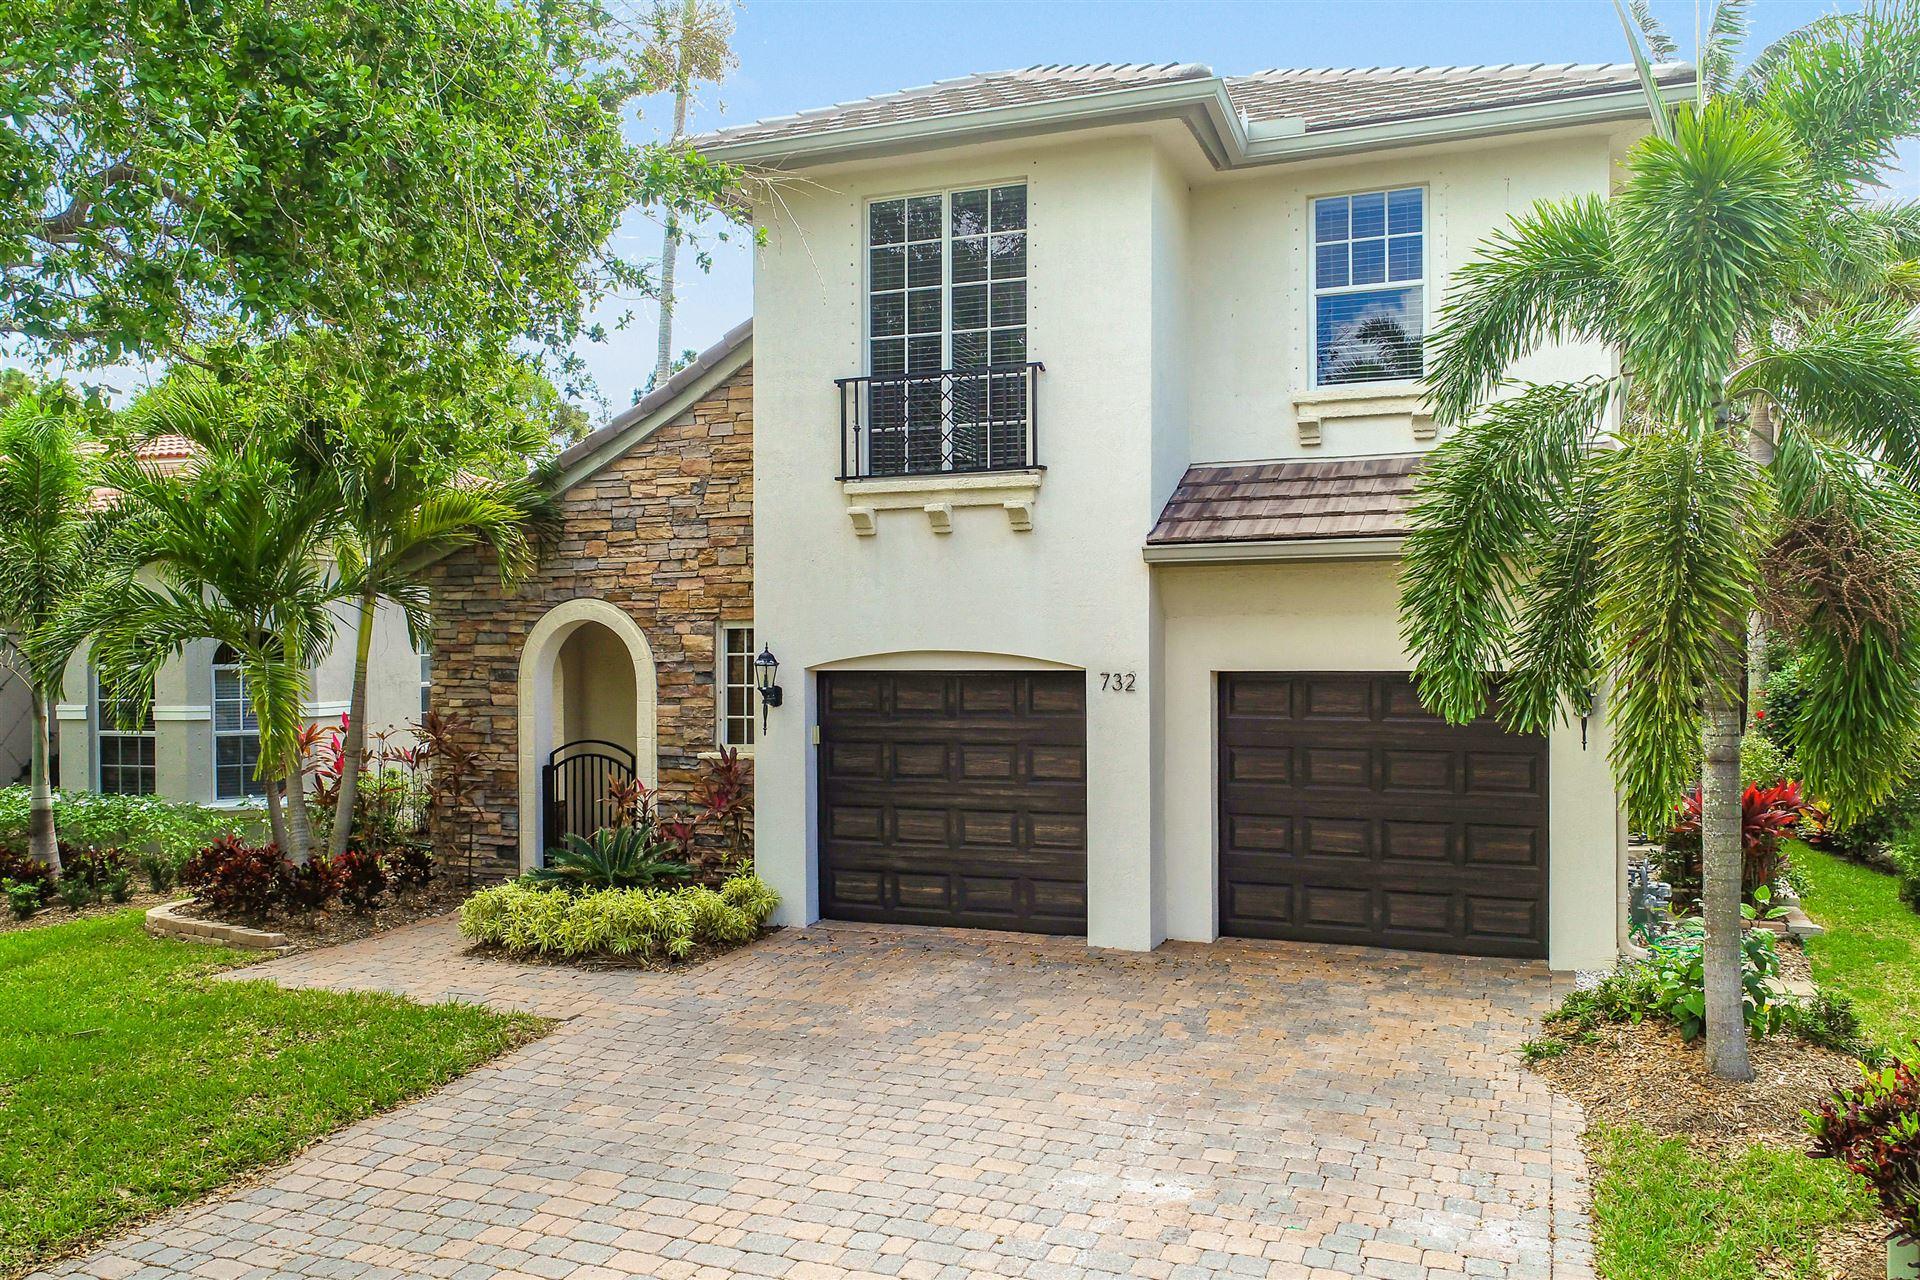 Photo of 732 Bocce Court, Palm Beach Gardens, FL 33410 (MLS # RX-10611509)